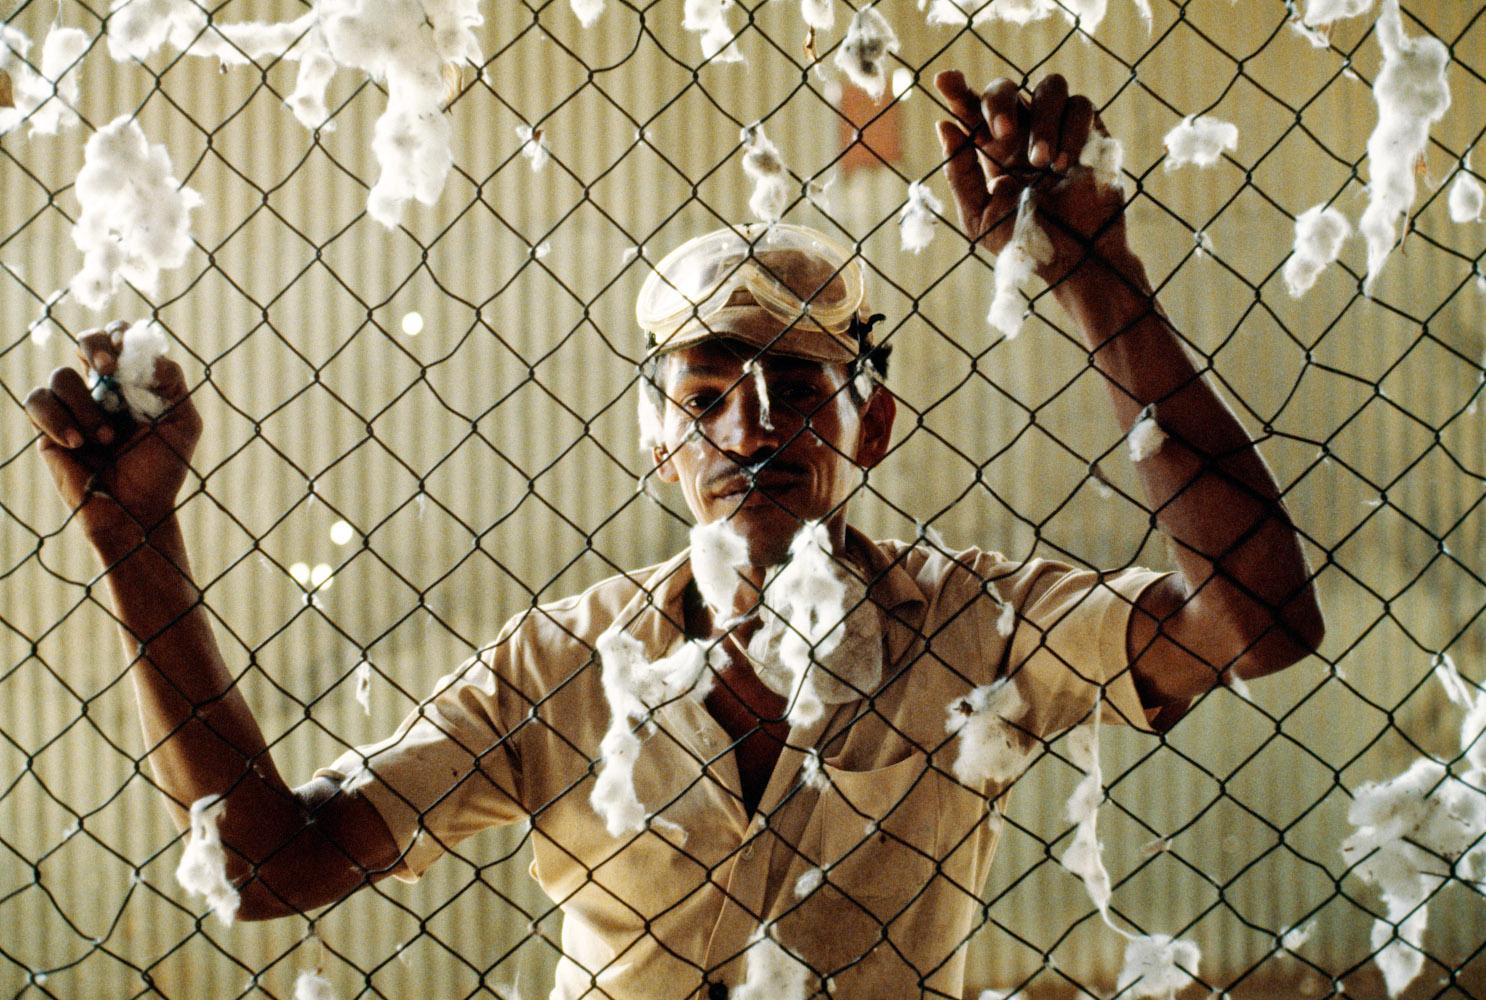 65_Nicaragua_Cotton_worker